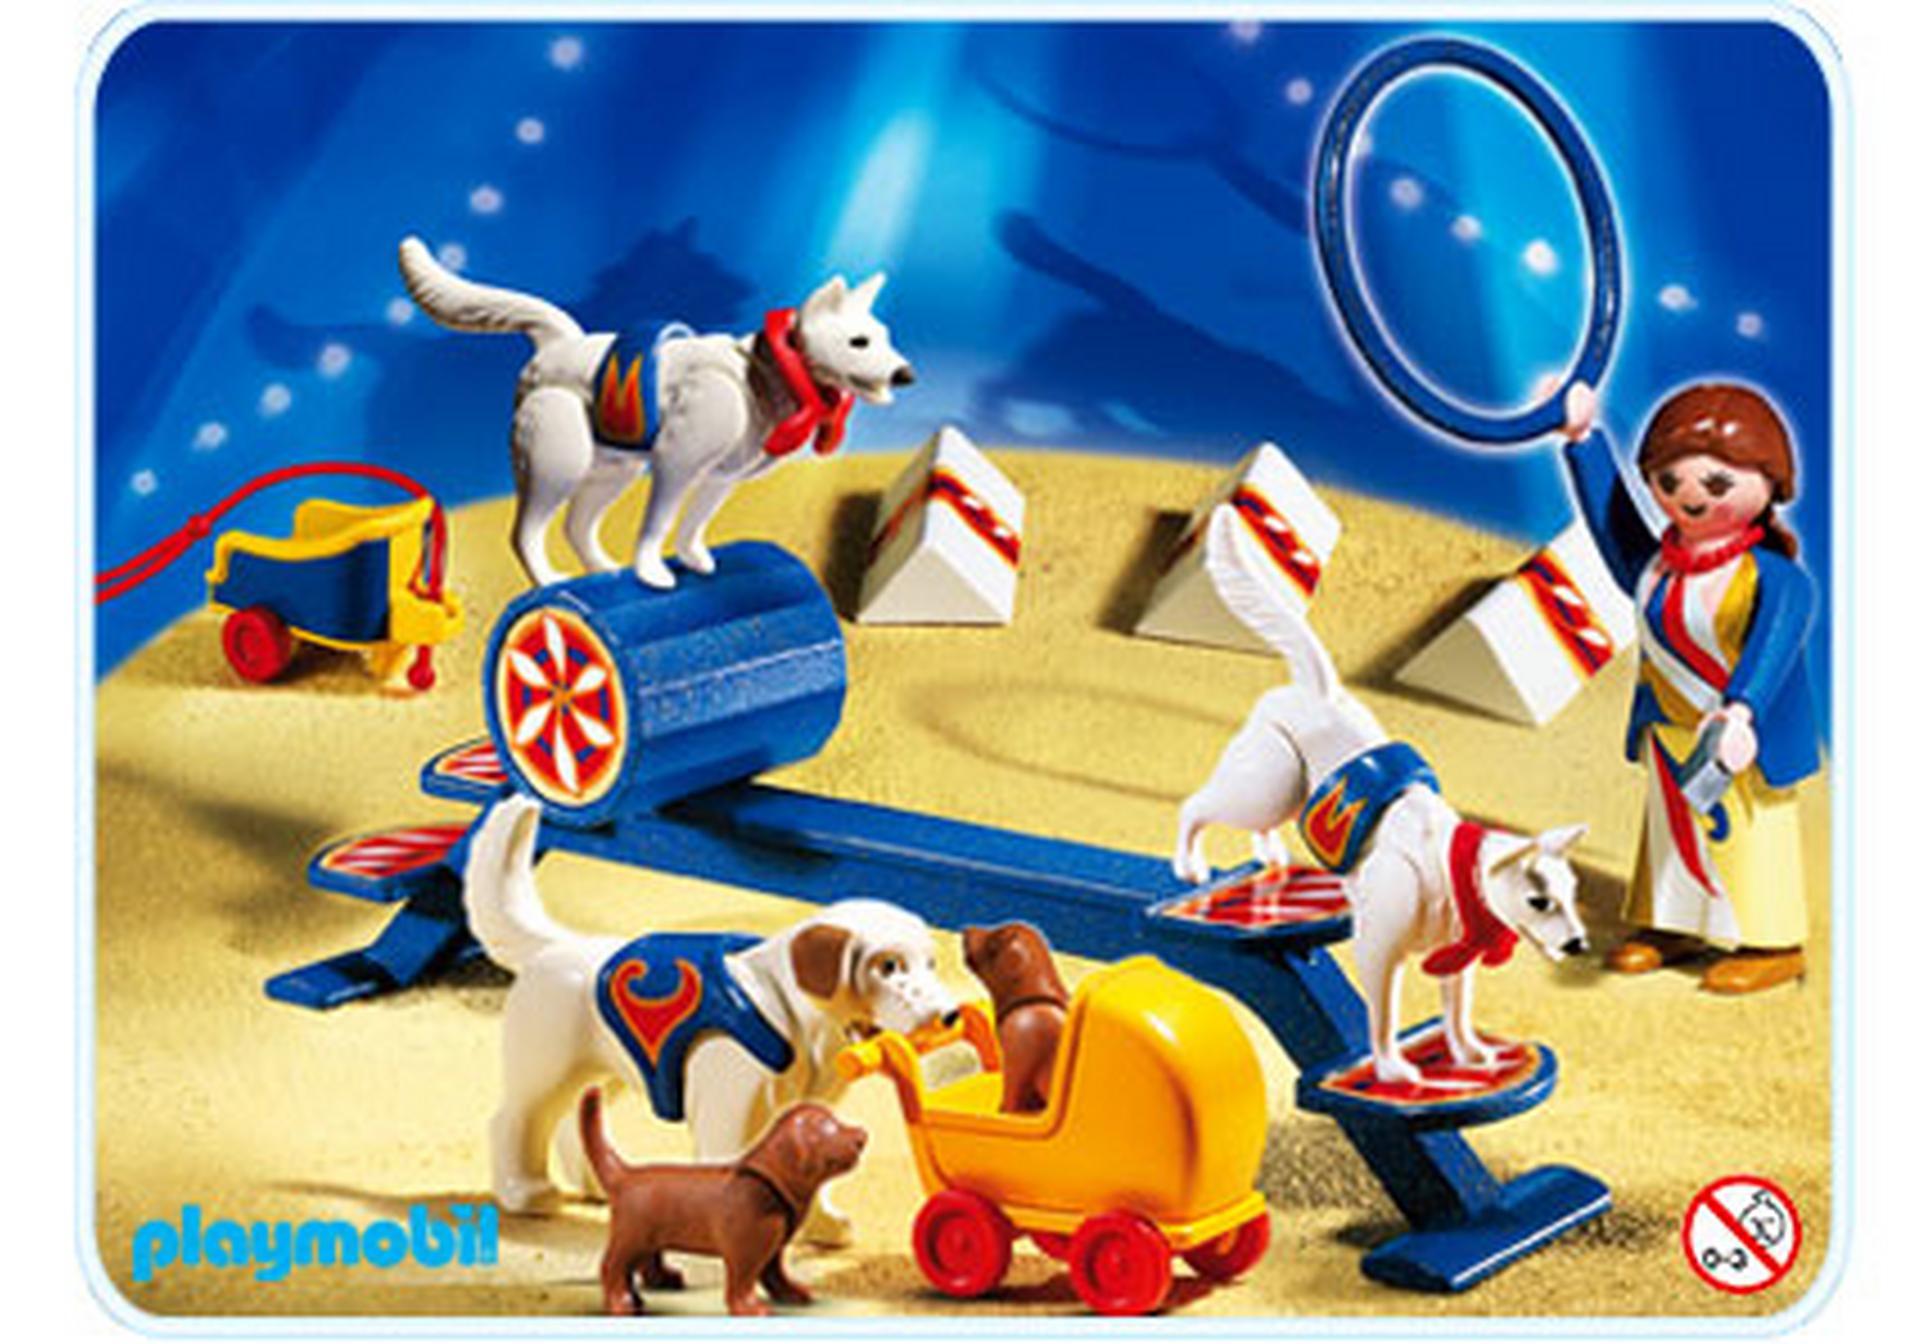 Educatrice avec chiens savants 4237 a playmobil france - Cirque playmobil ...